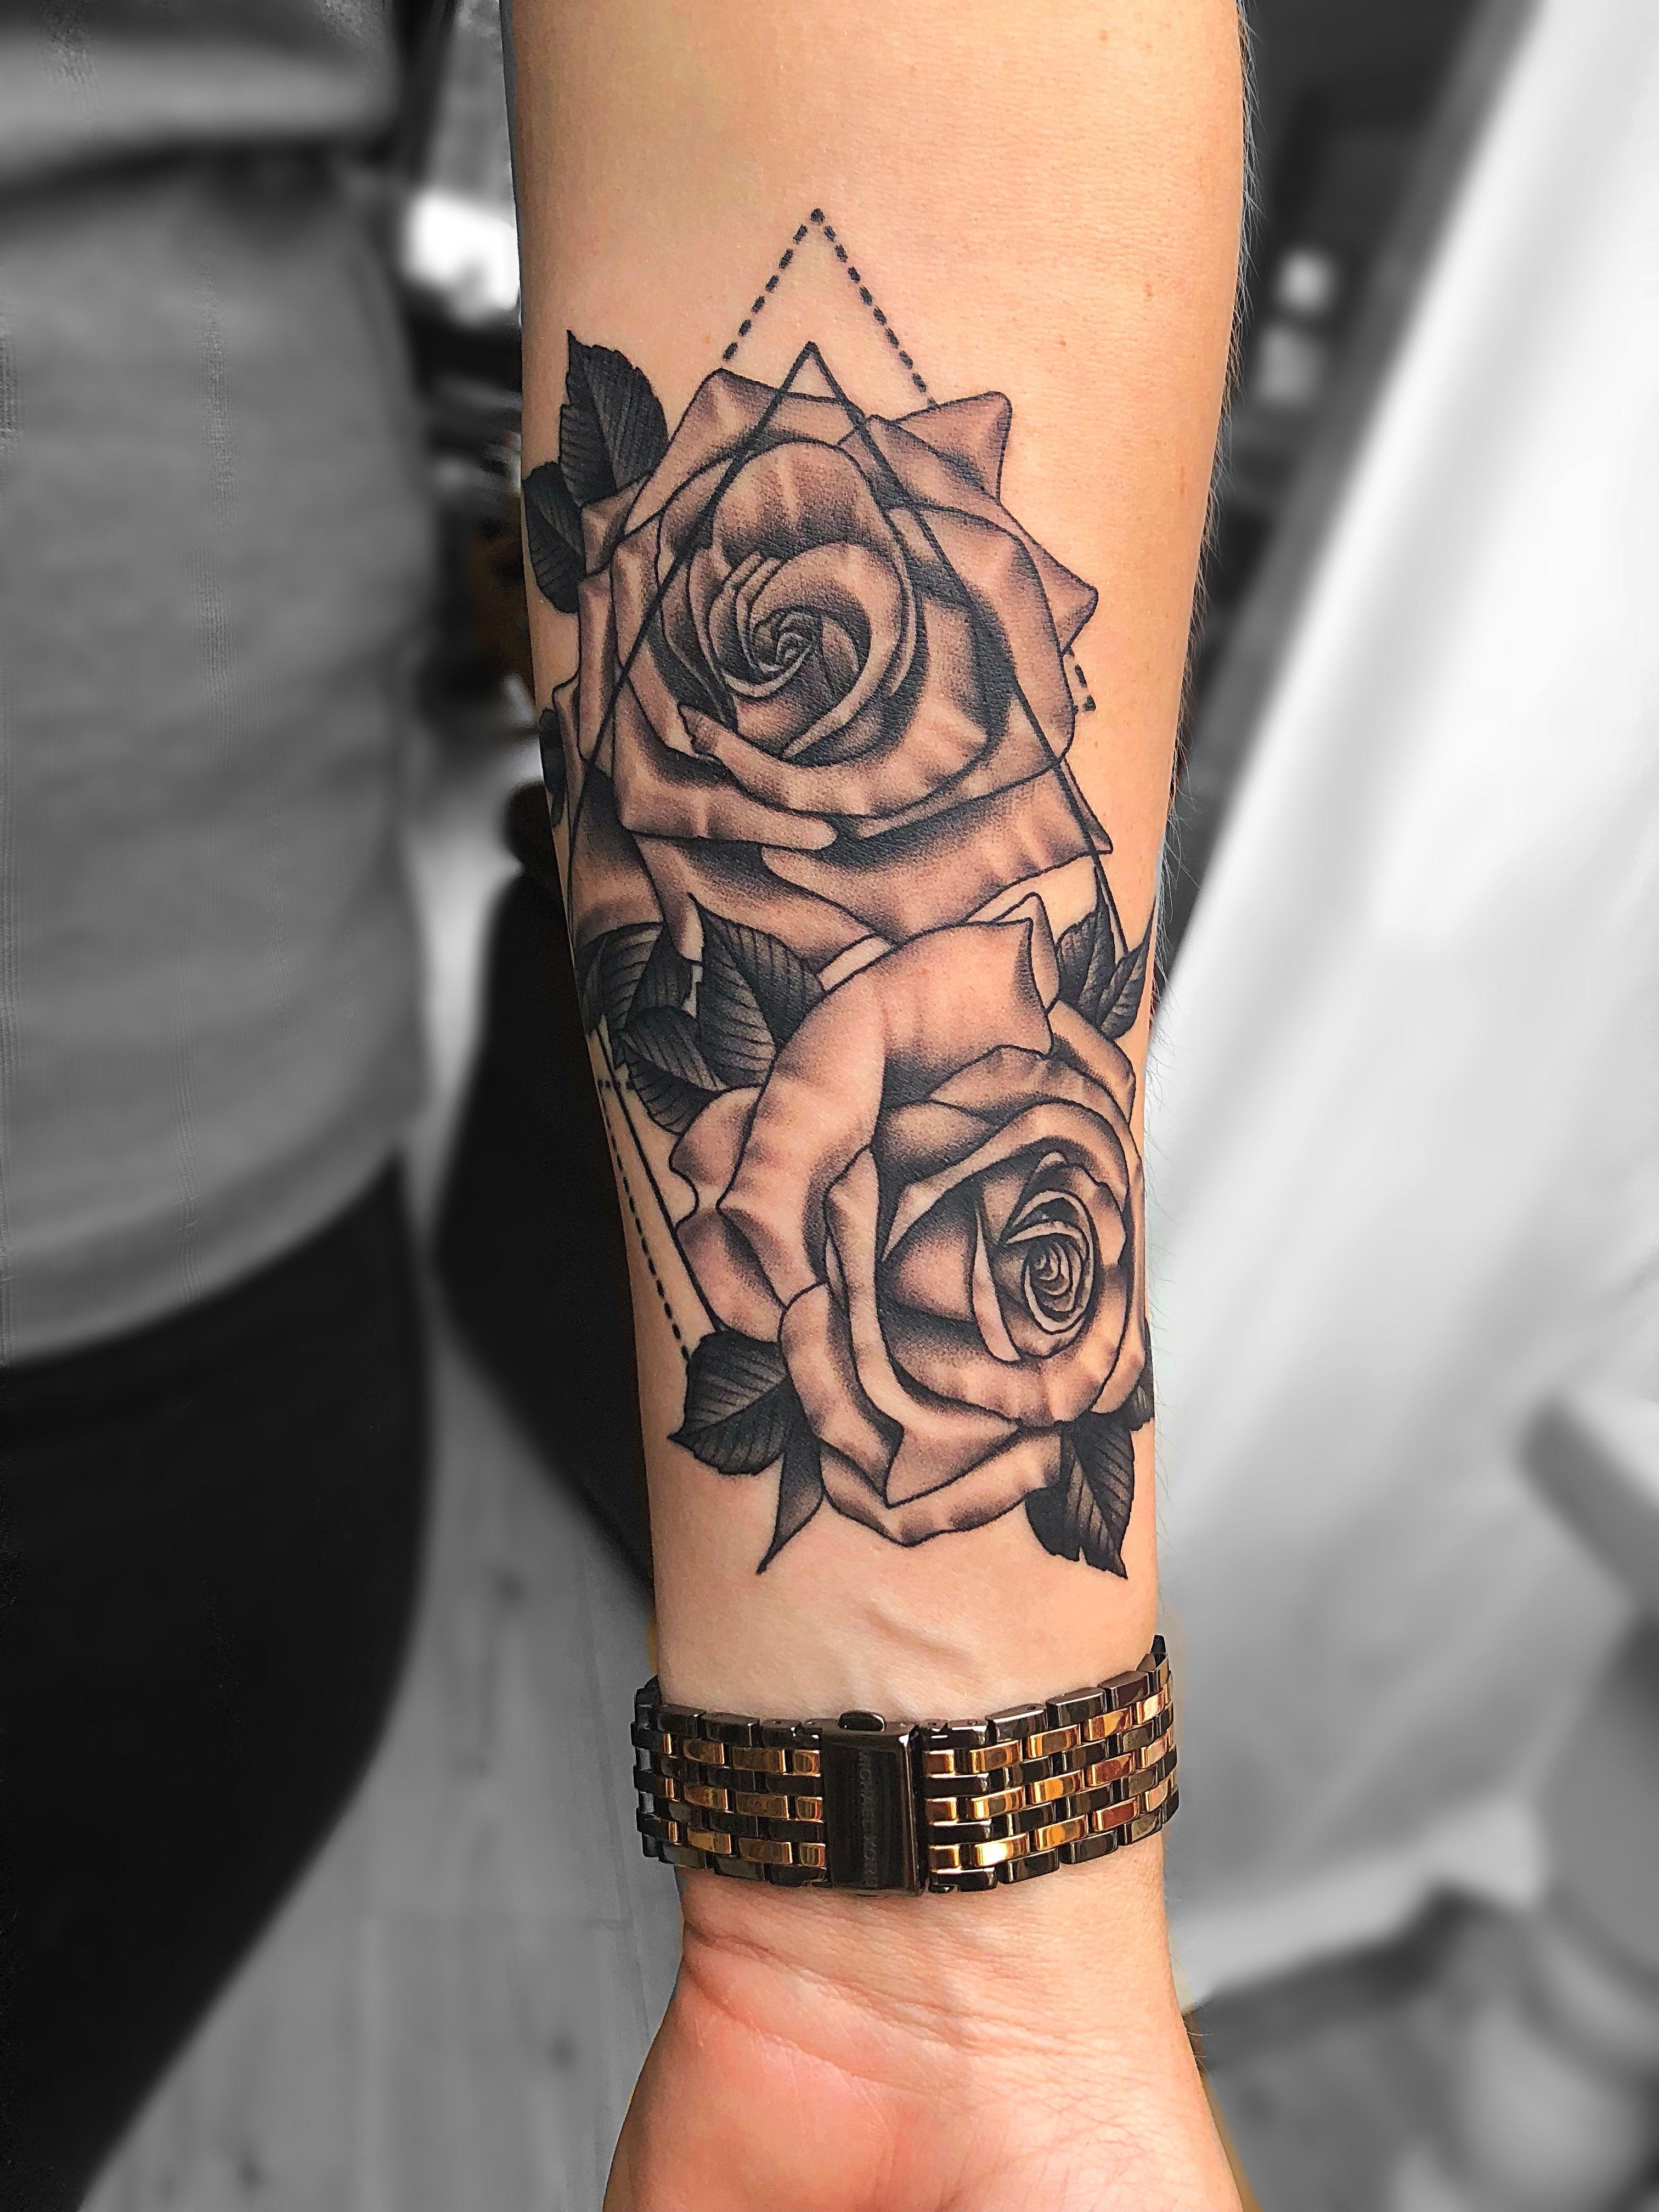 Rose Tattoo On Arm : tattoo, Roses, Forearm, Tattoo, Women,, Tattoos,, Design